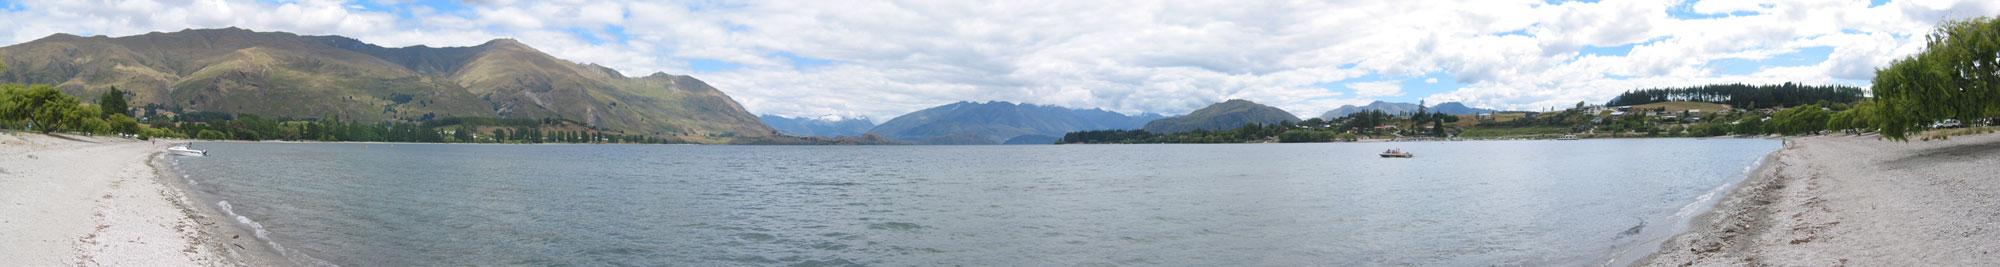 Lake Wanaka Pano